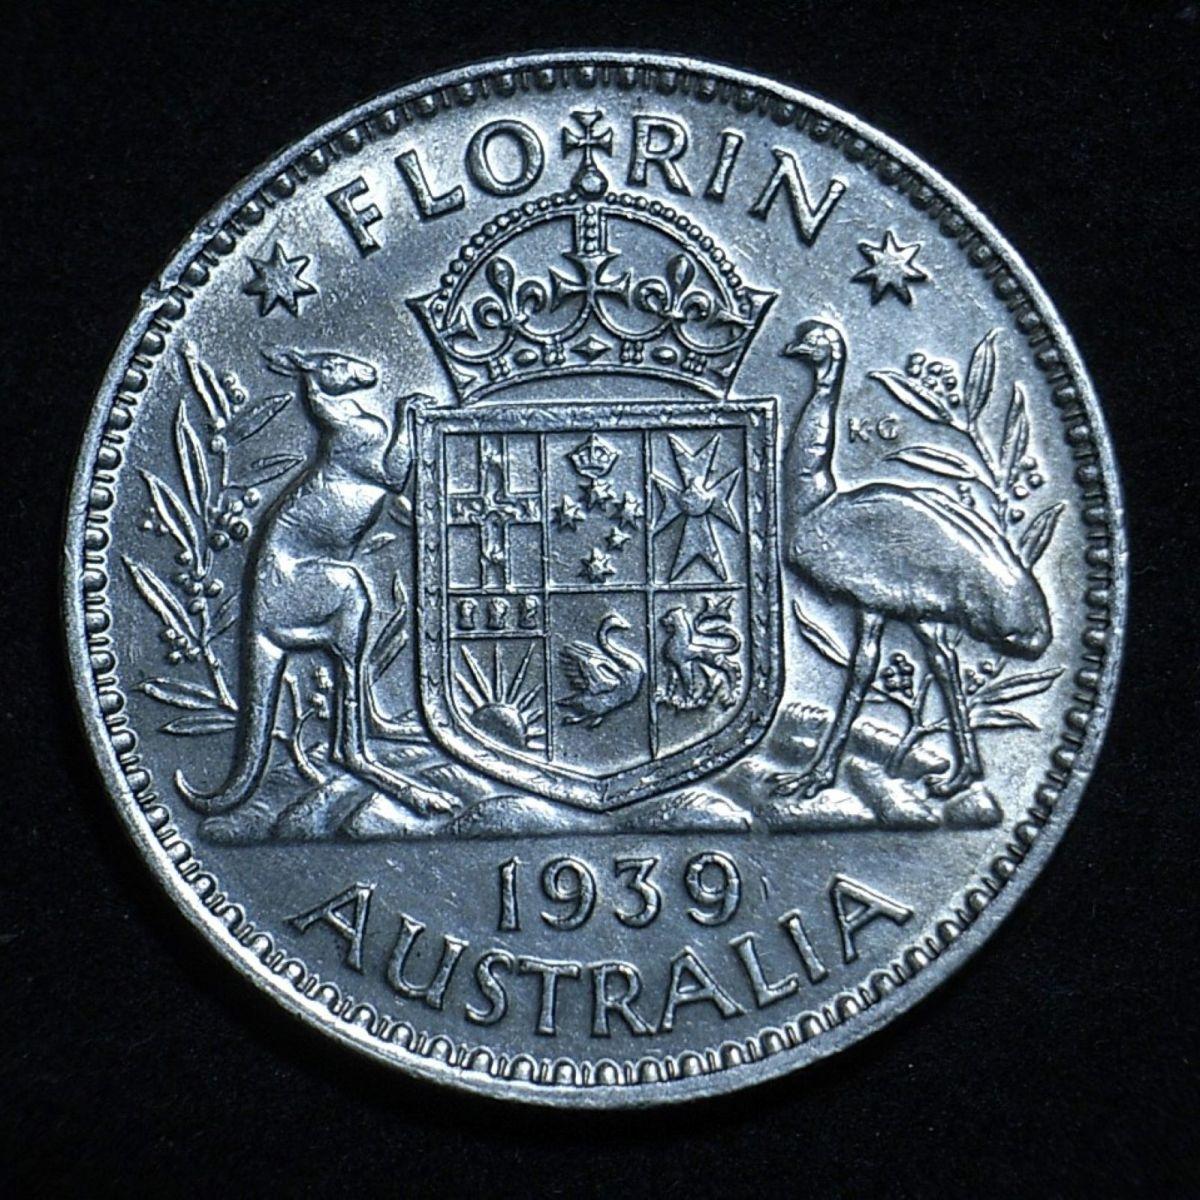 Aussie 1939 florin reverse close up, new light angle